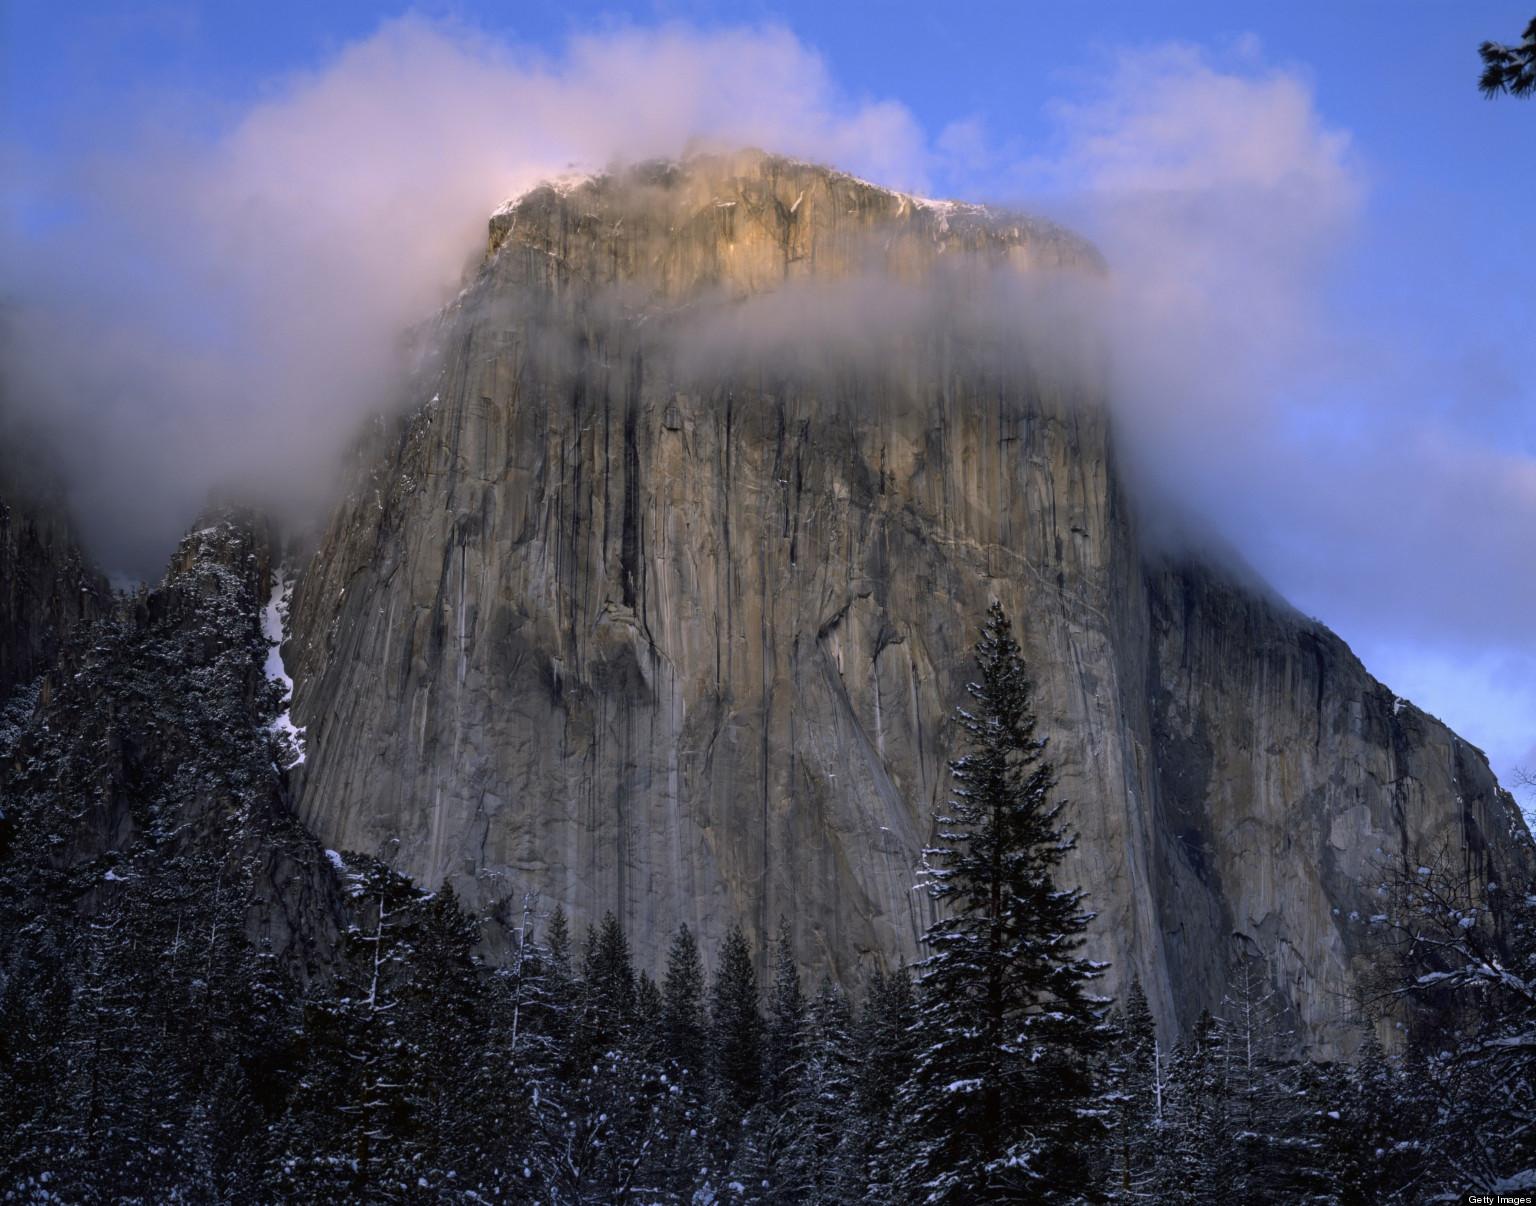 Good Wallpaper Macbook Yosemite - 7MEQ8v  Pictures_26394.jpg